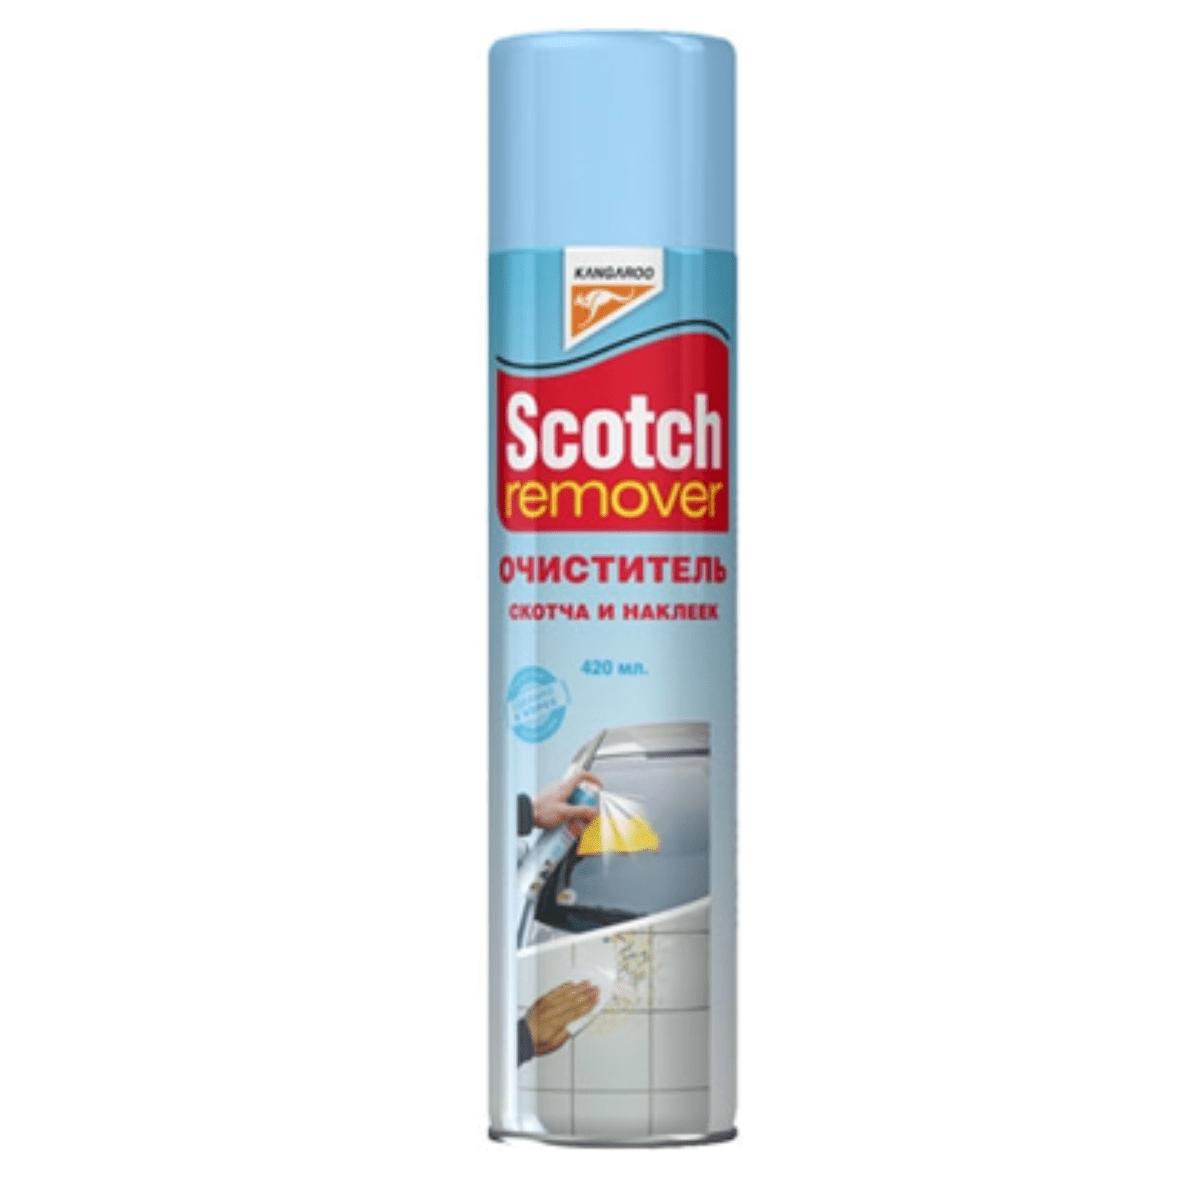 Scotch Remover